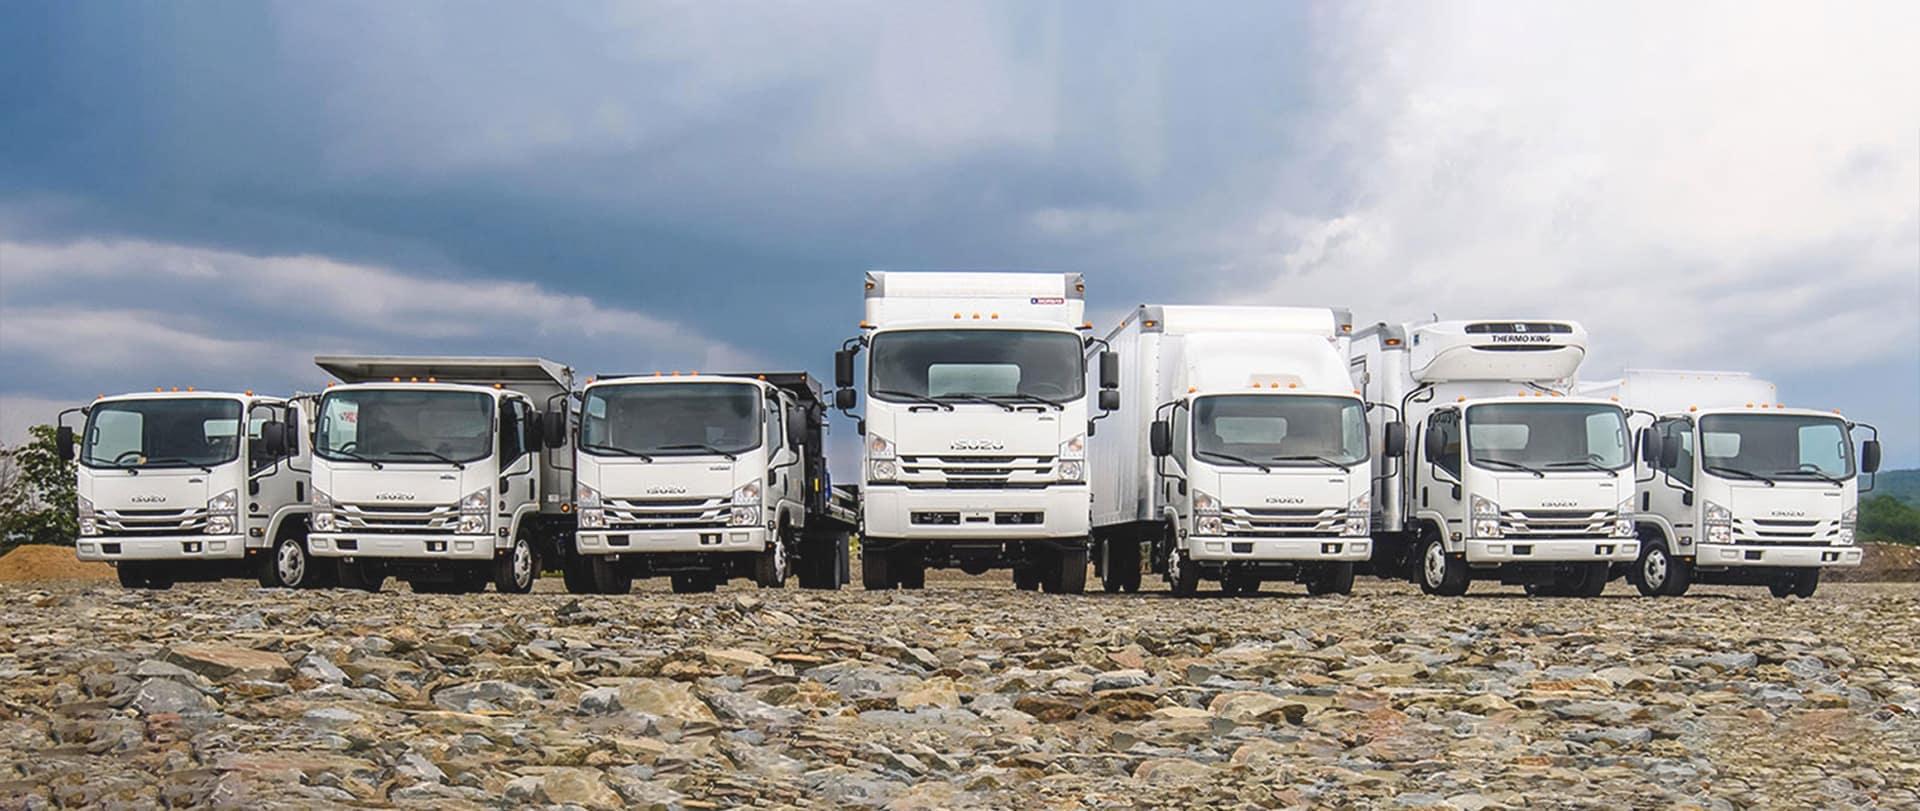 A row of Isuzu trucks